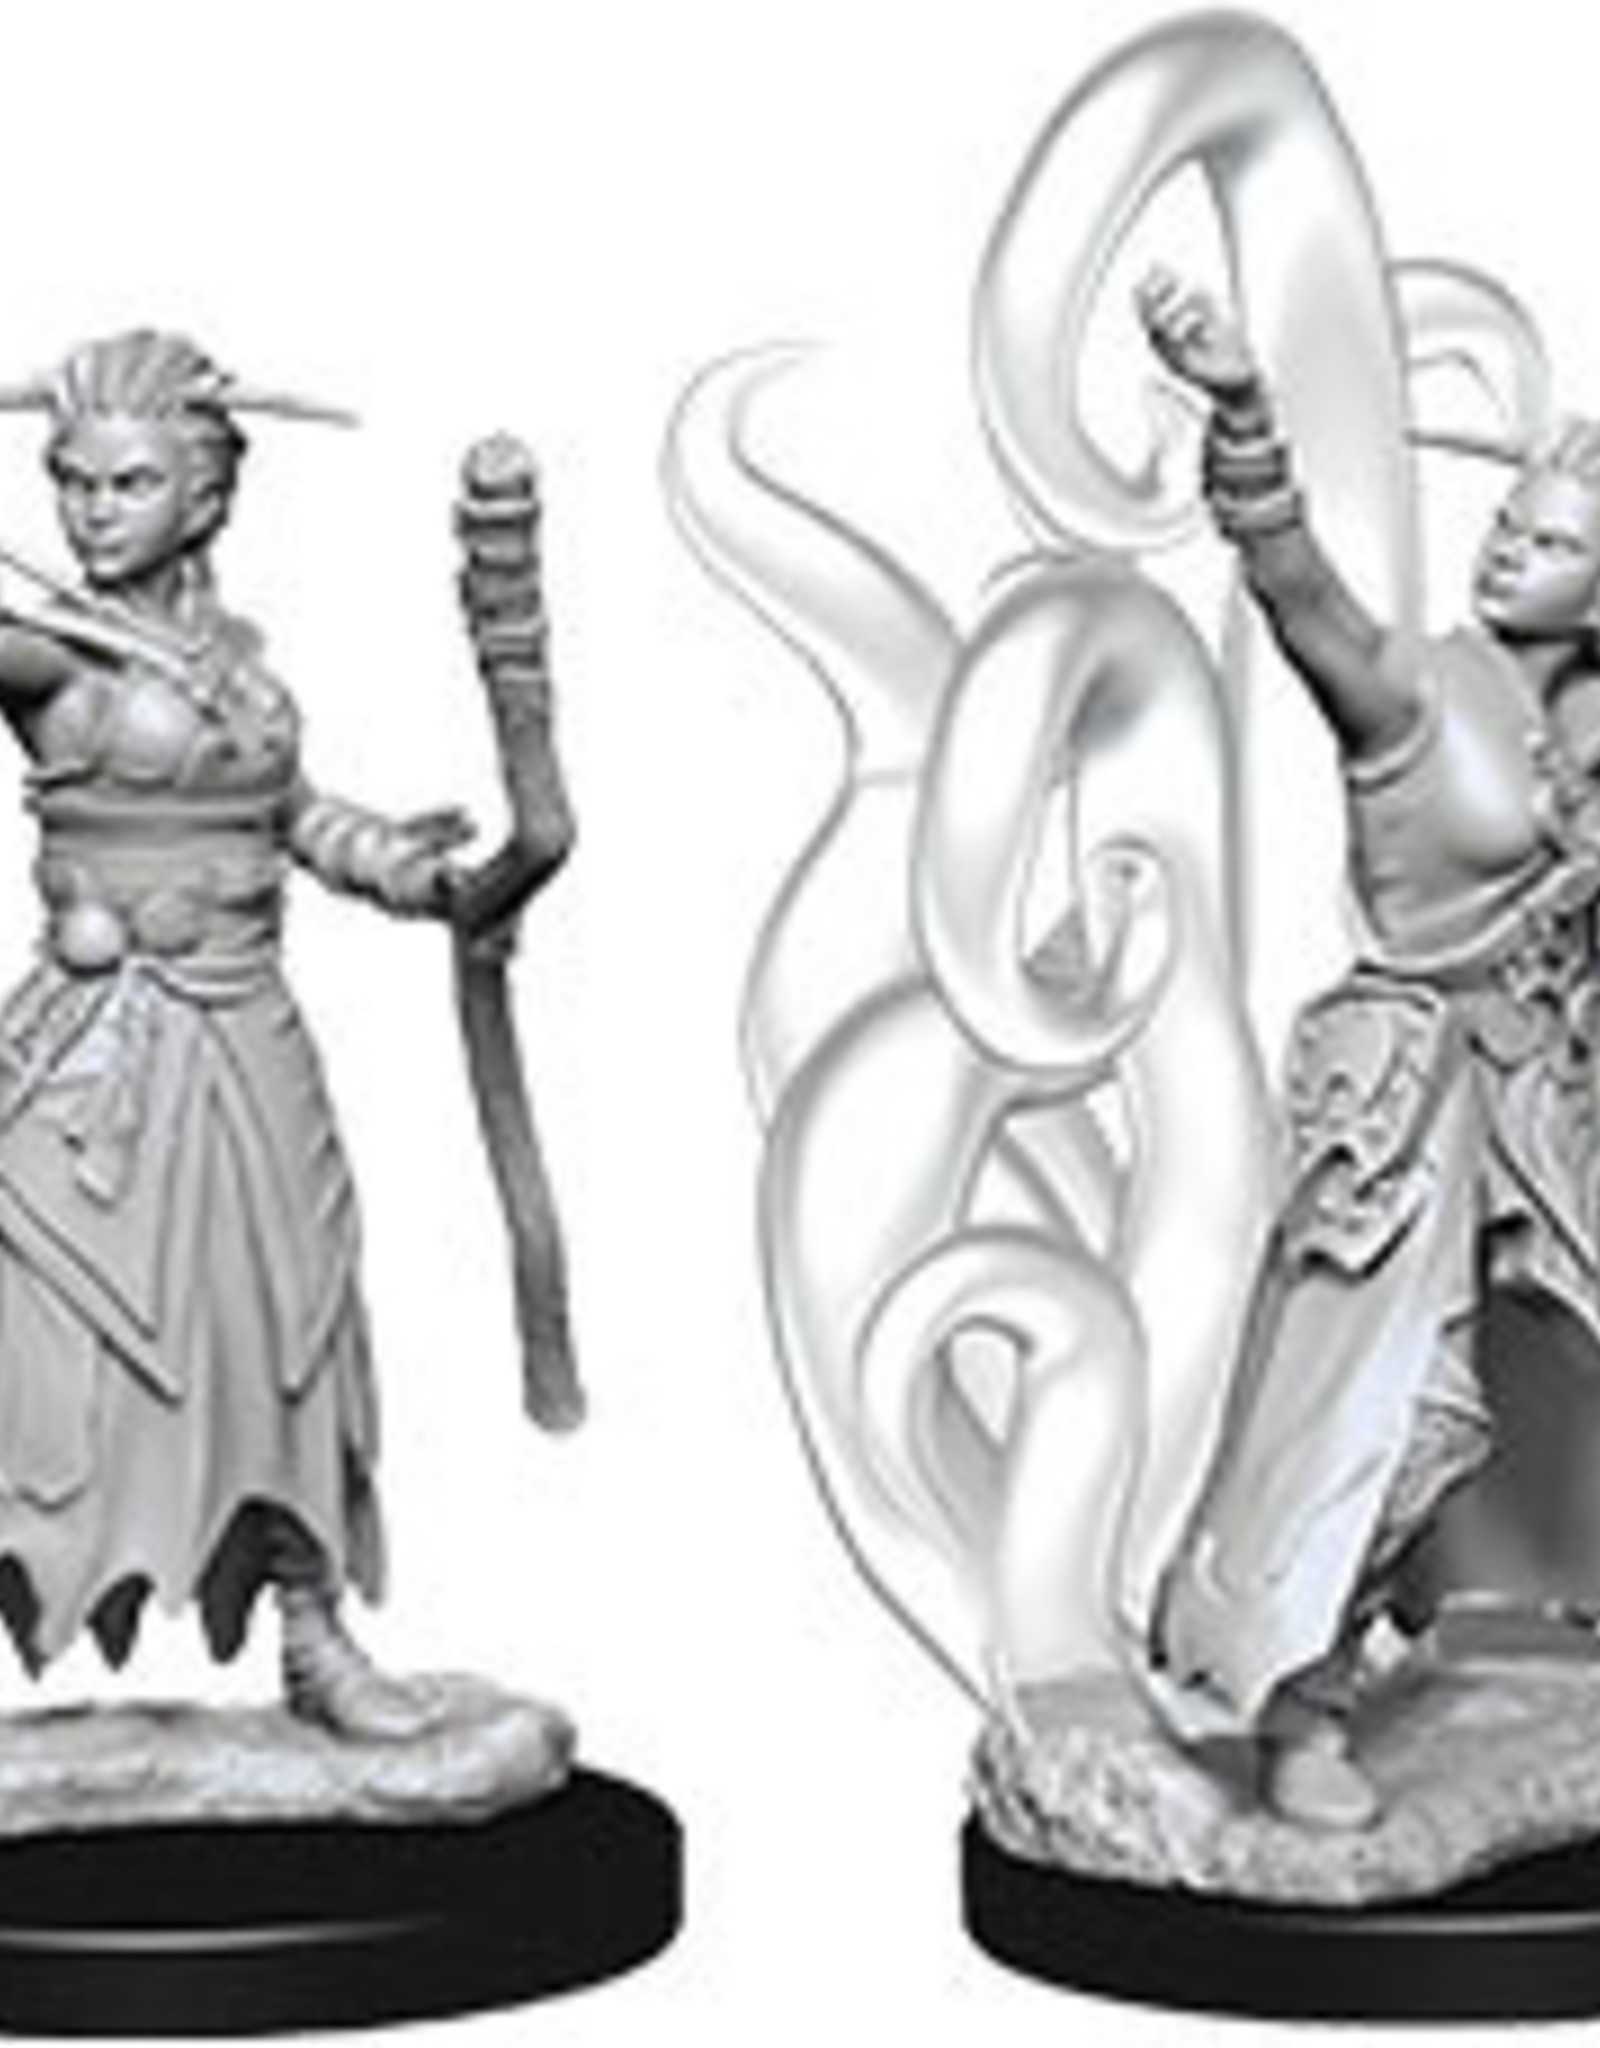 WizKids Dungeons & Dragons Nolzur's Marvelous Miniatures: Female Human Warlock